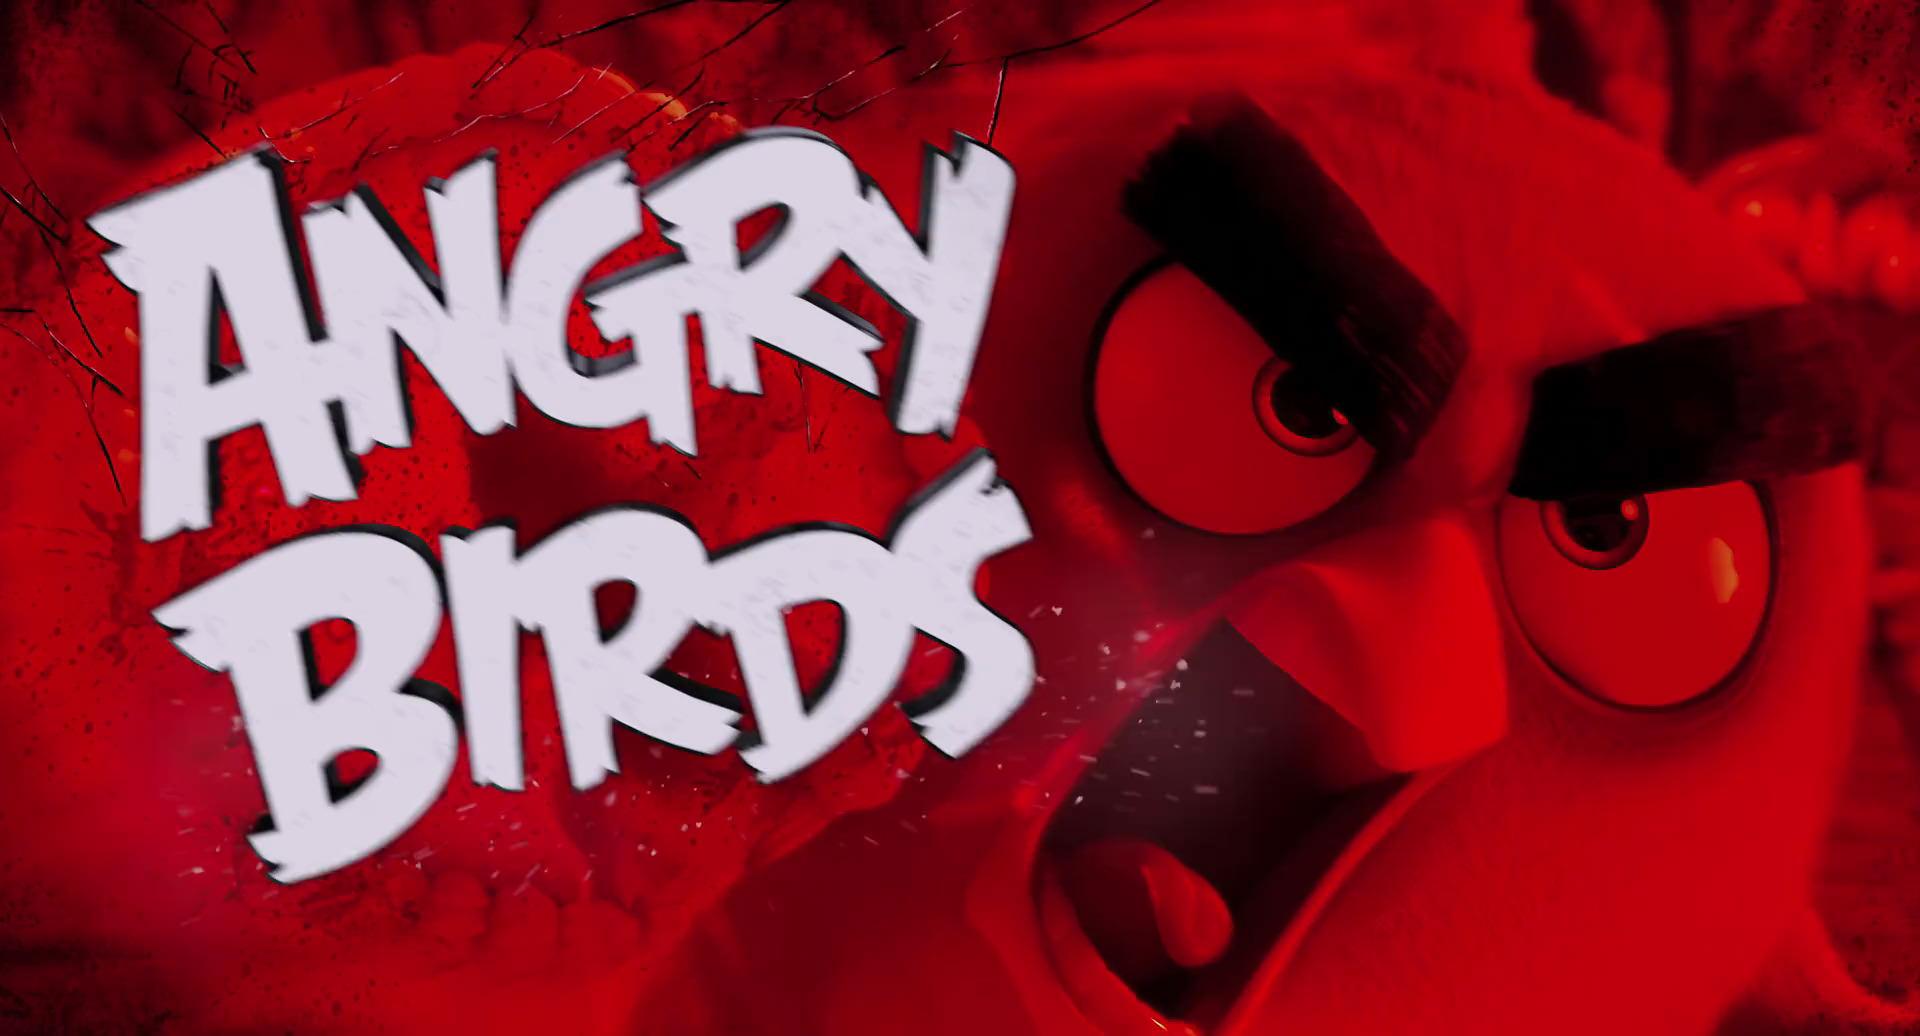 The Angry Birds Movie 2016 Screencaps Us